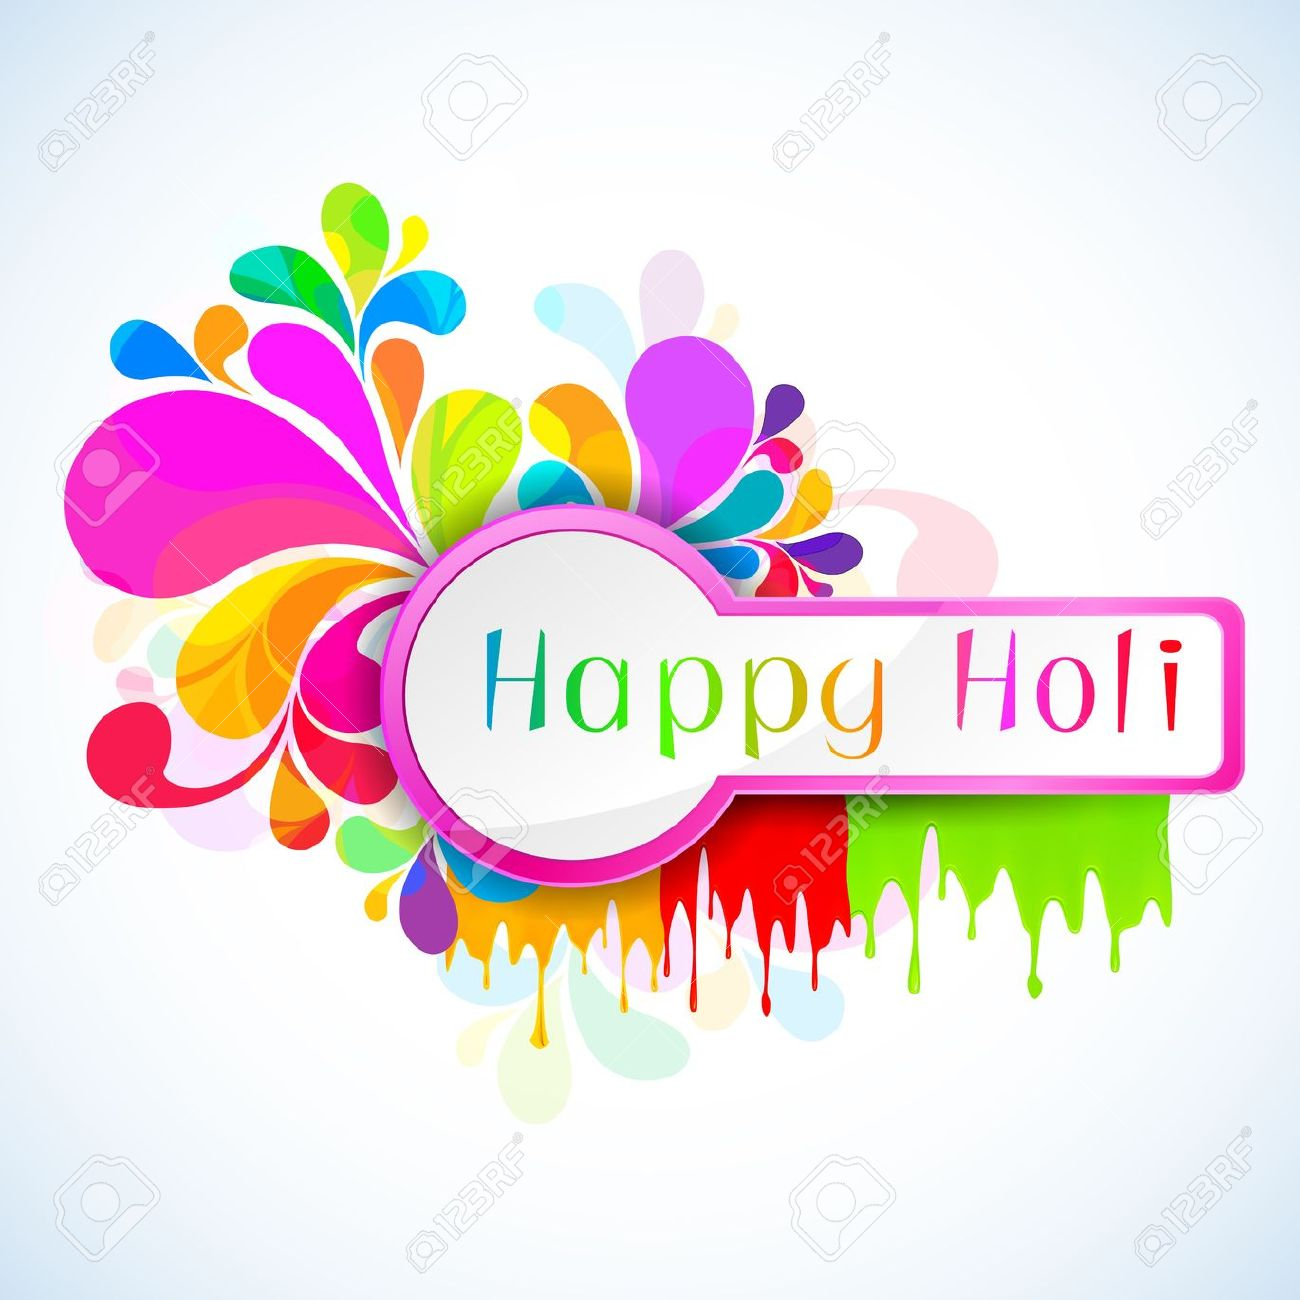 Happy holi hd clipart.